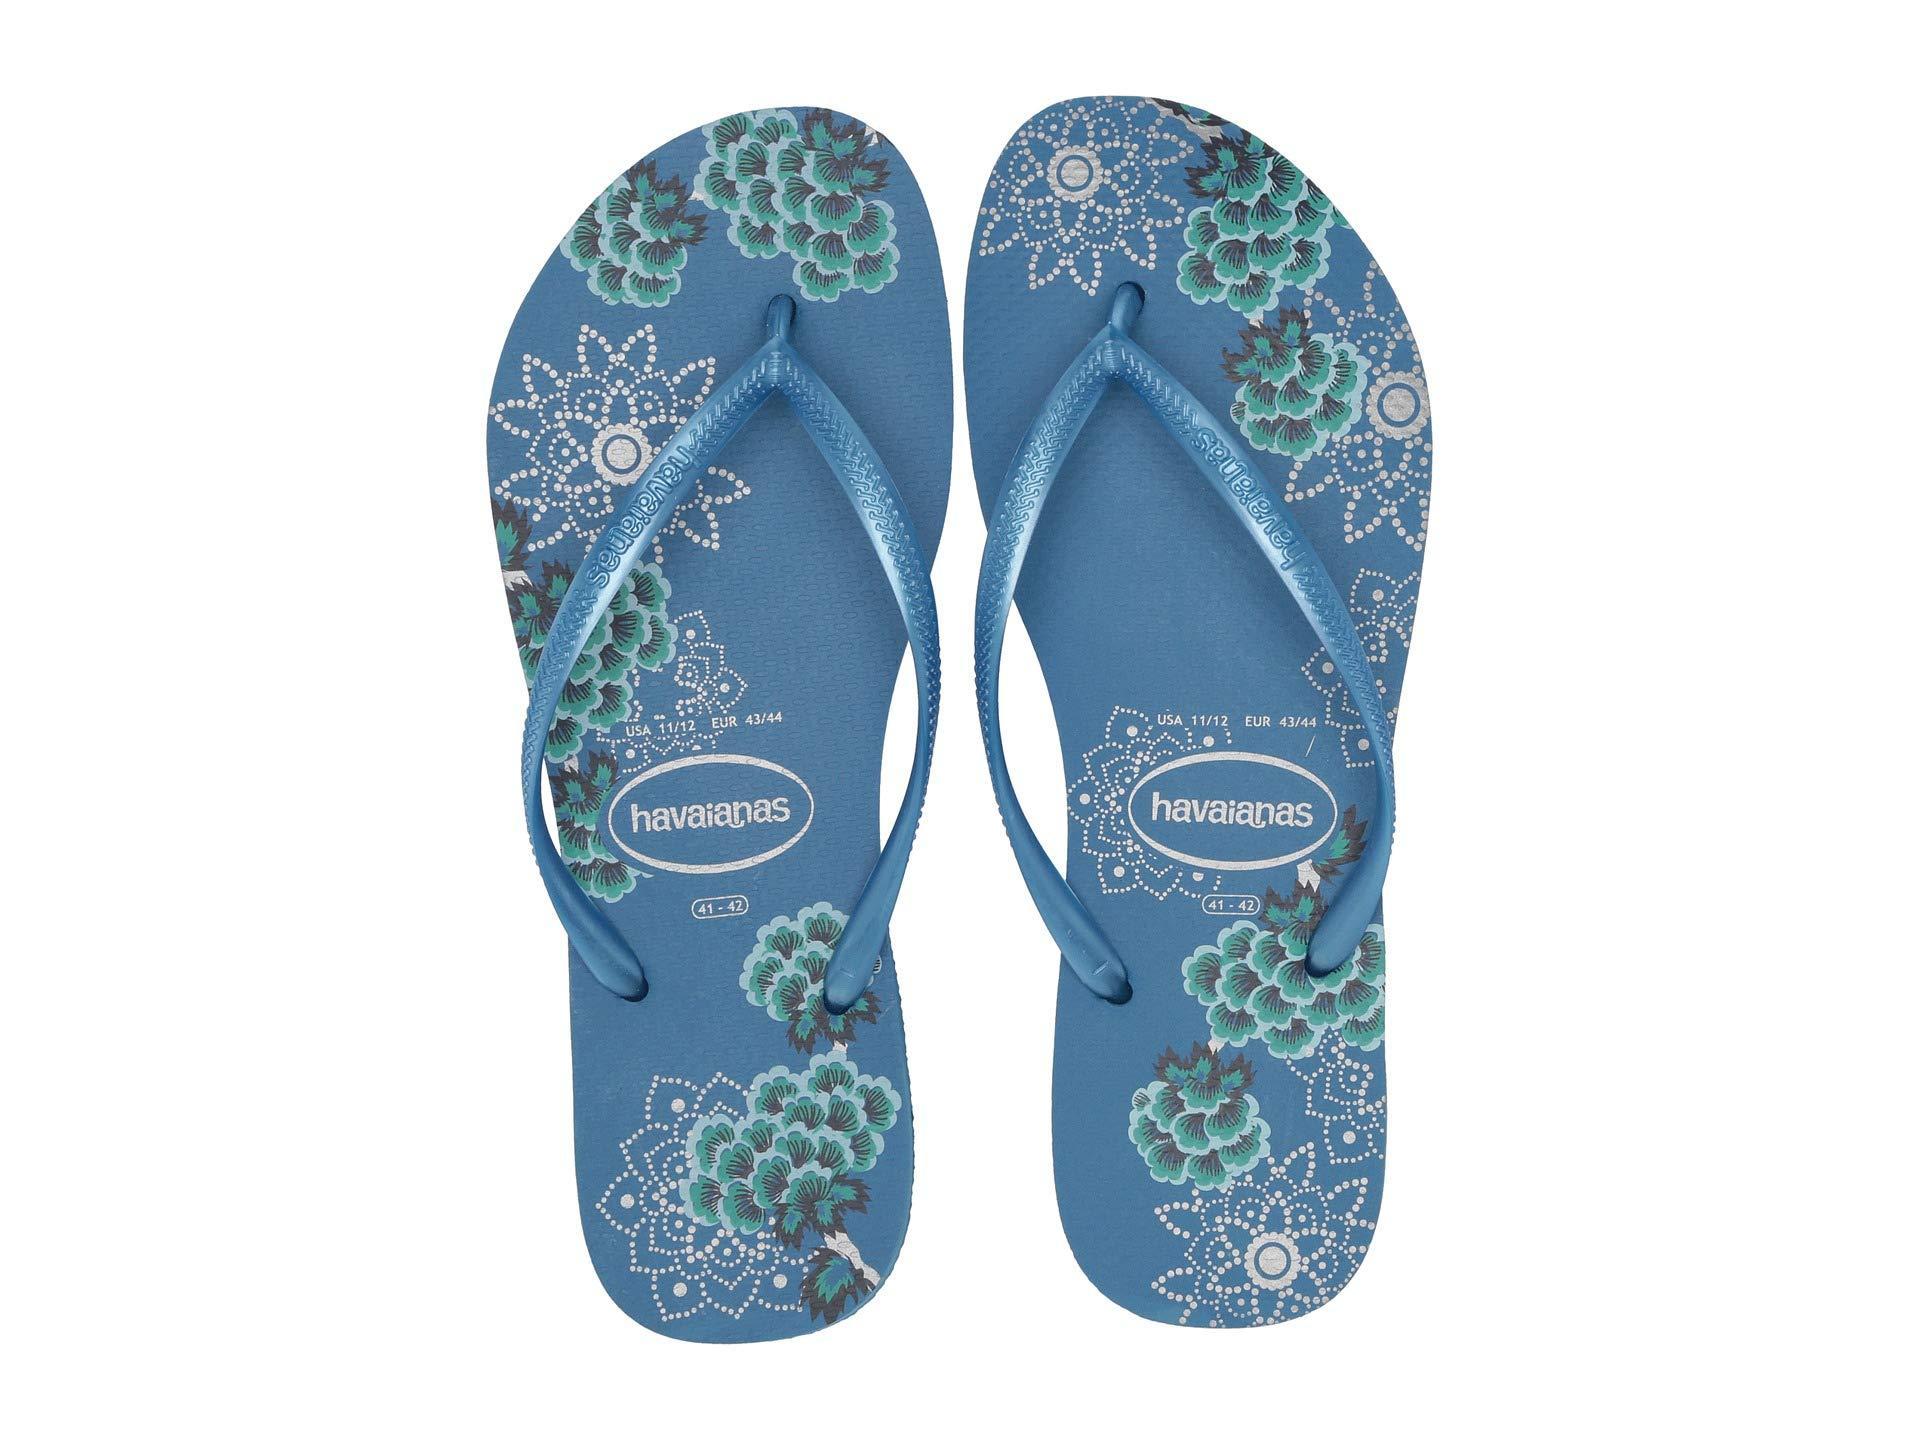 9c5be8cd5 Lyst - Havaianas Slim Organic Flip Flops (sand Grey) Women s Sandals ...